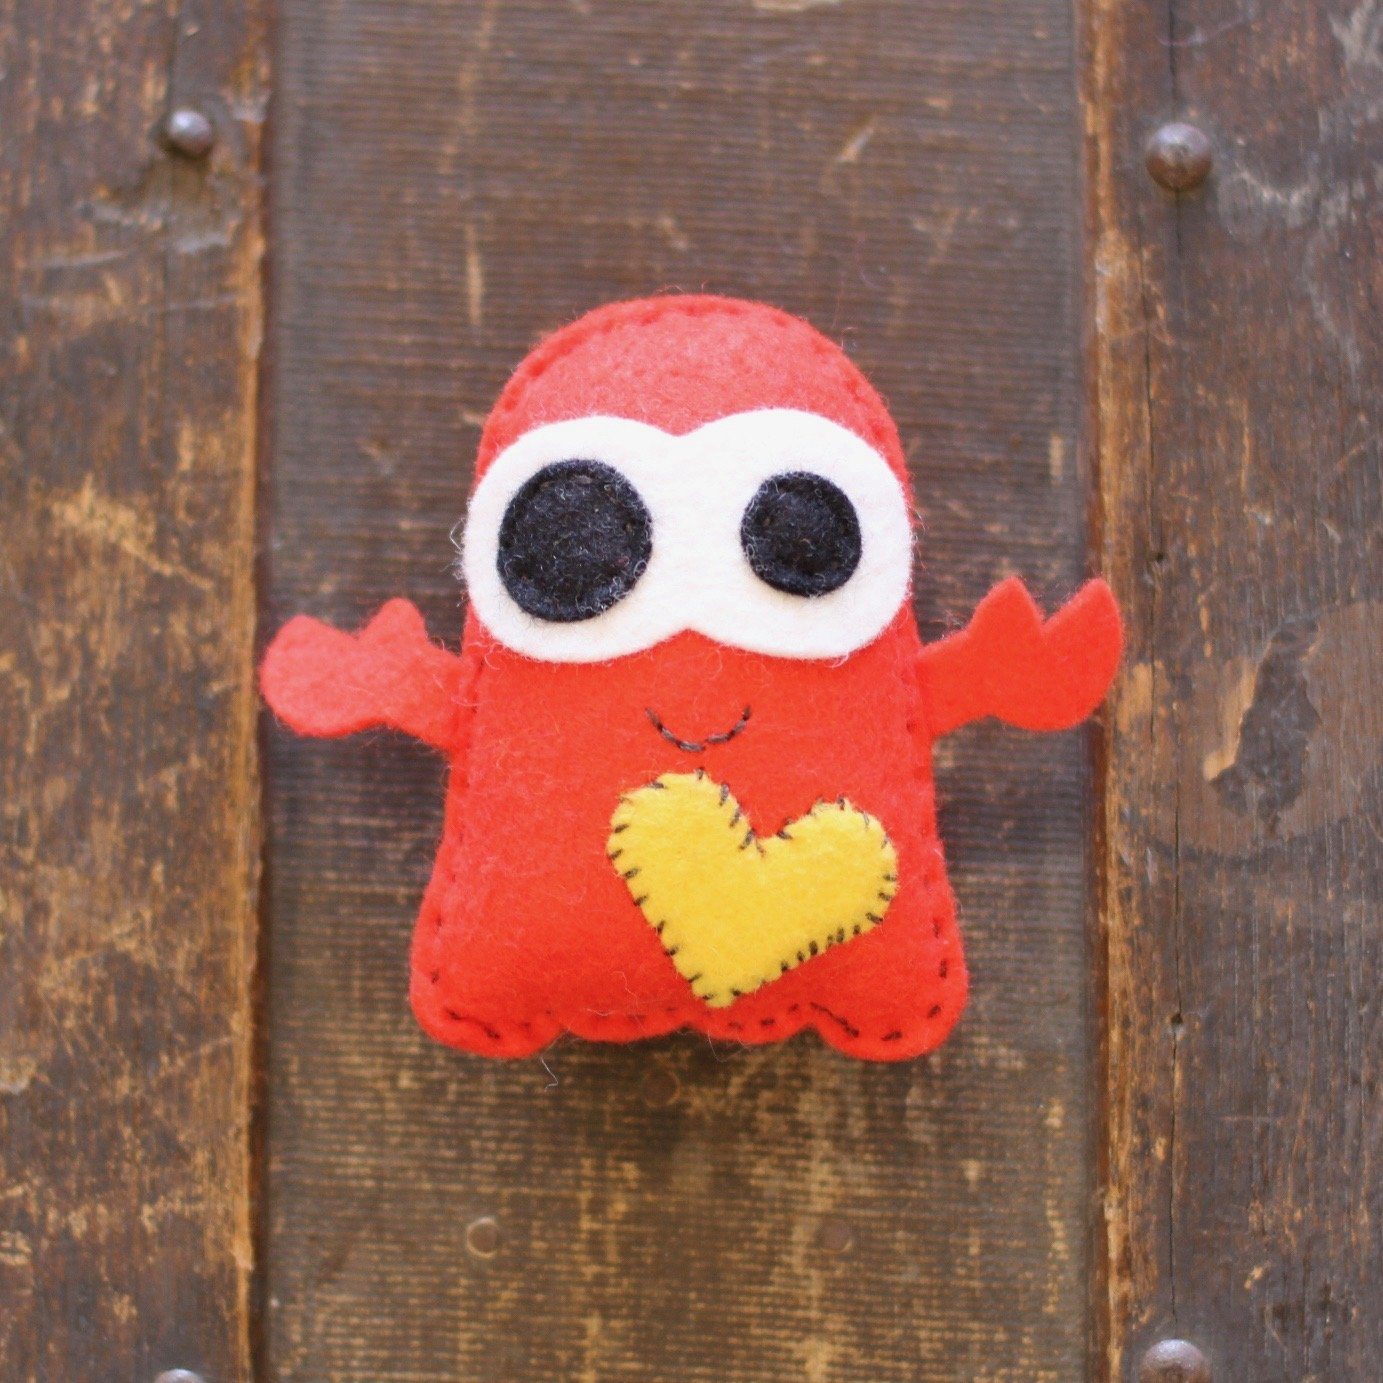 TubbyWubby Stitch & Stuff Critter Kit - Crusty the Crab